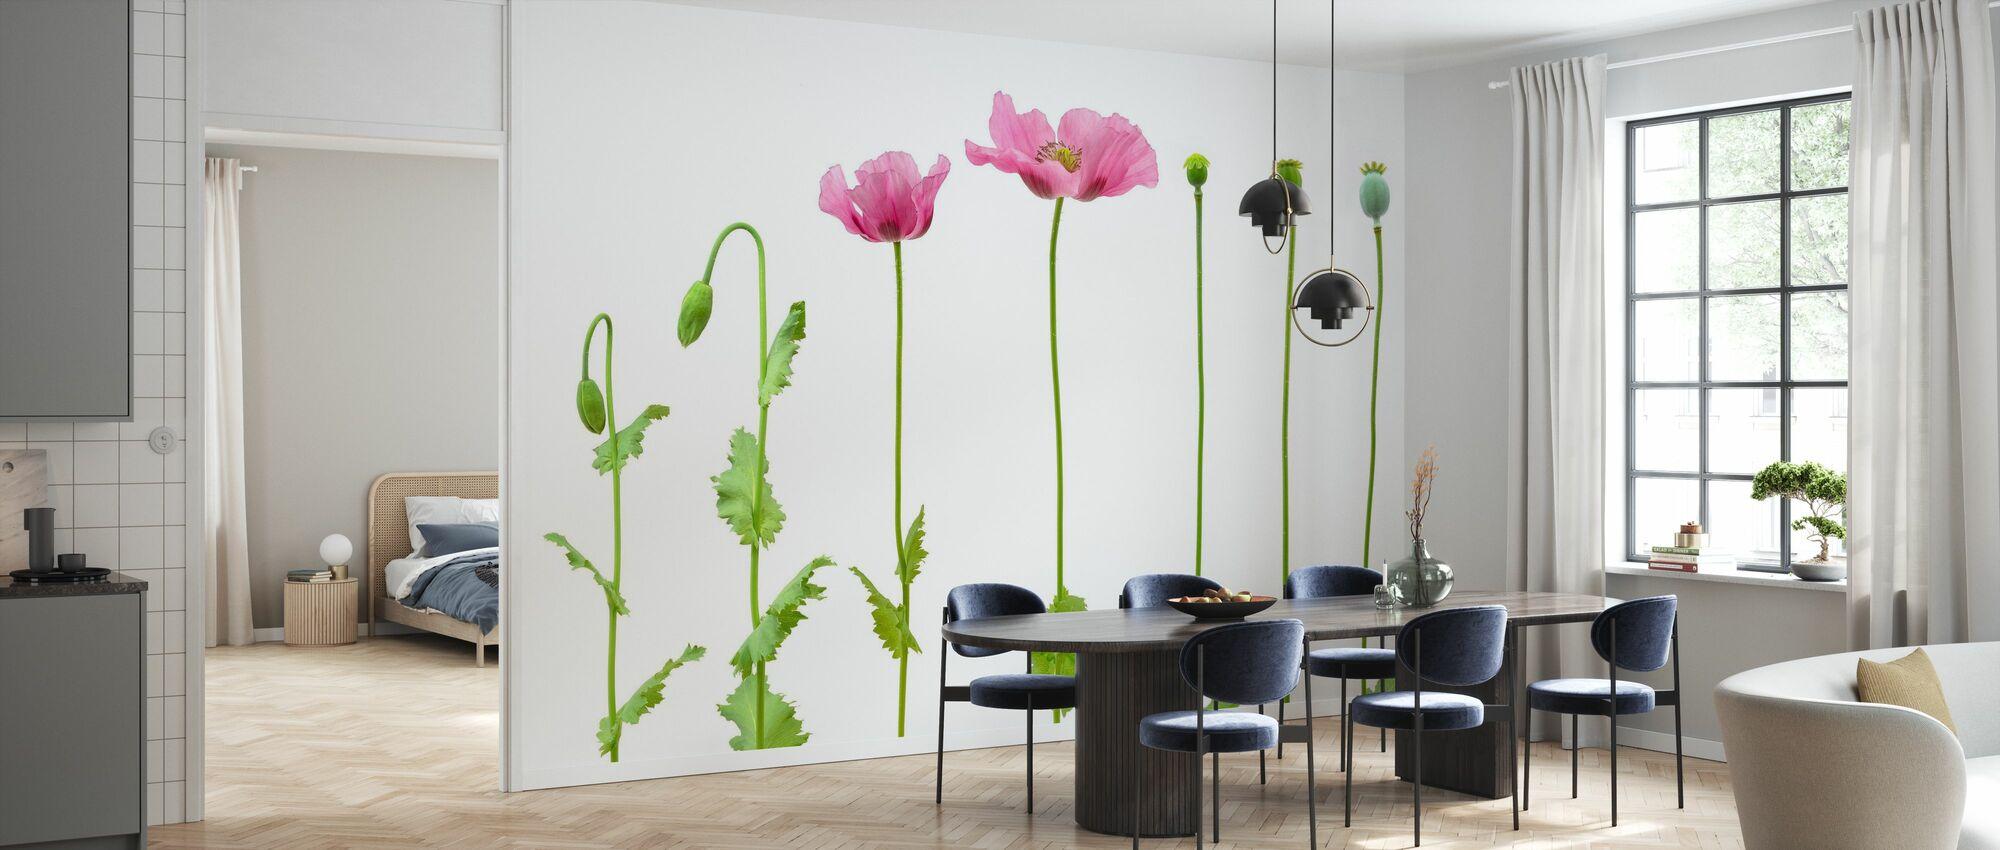 Evolution of Opium Poppy - Wallpaper - Kitchen